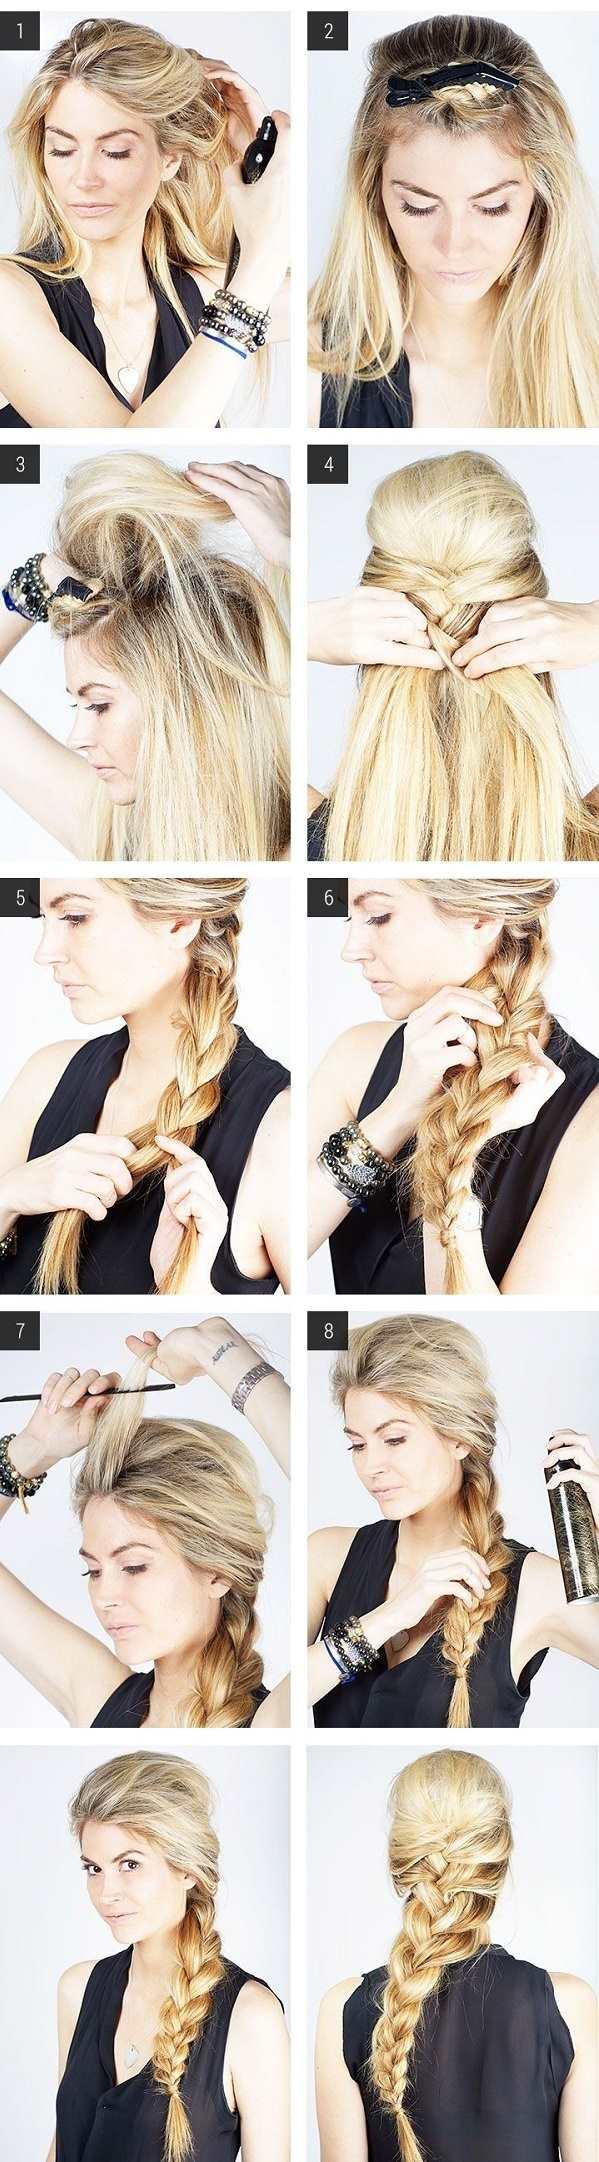 Swept Side Braid Hairstyle Tutorial